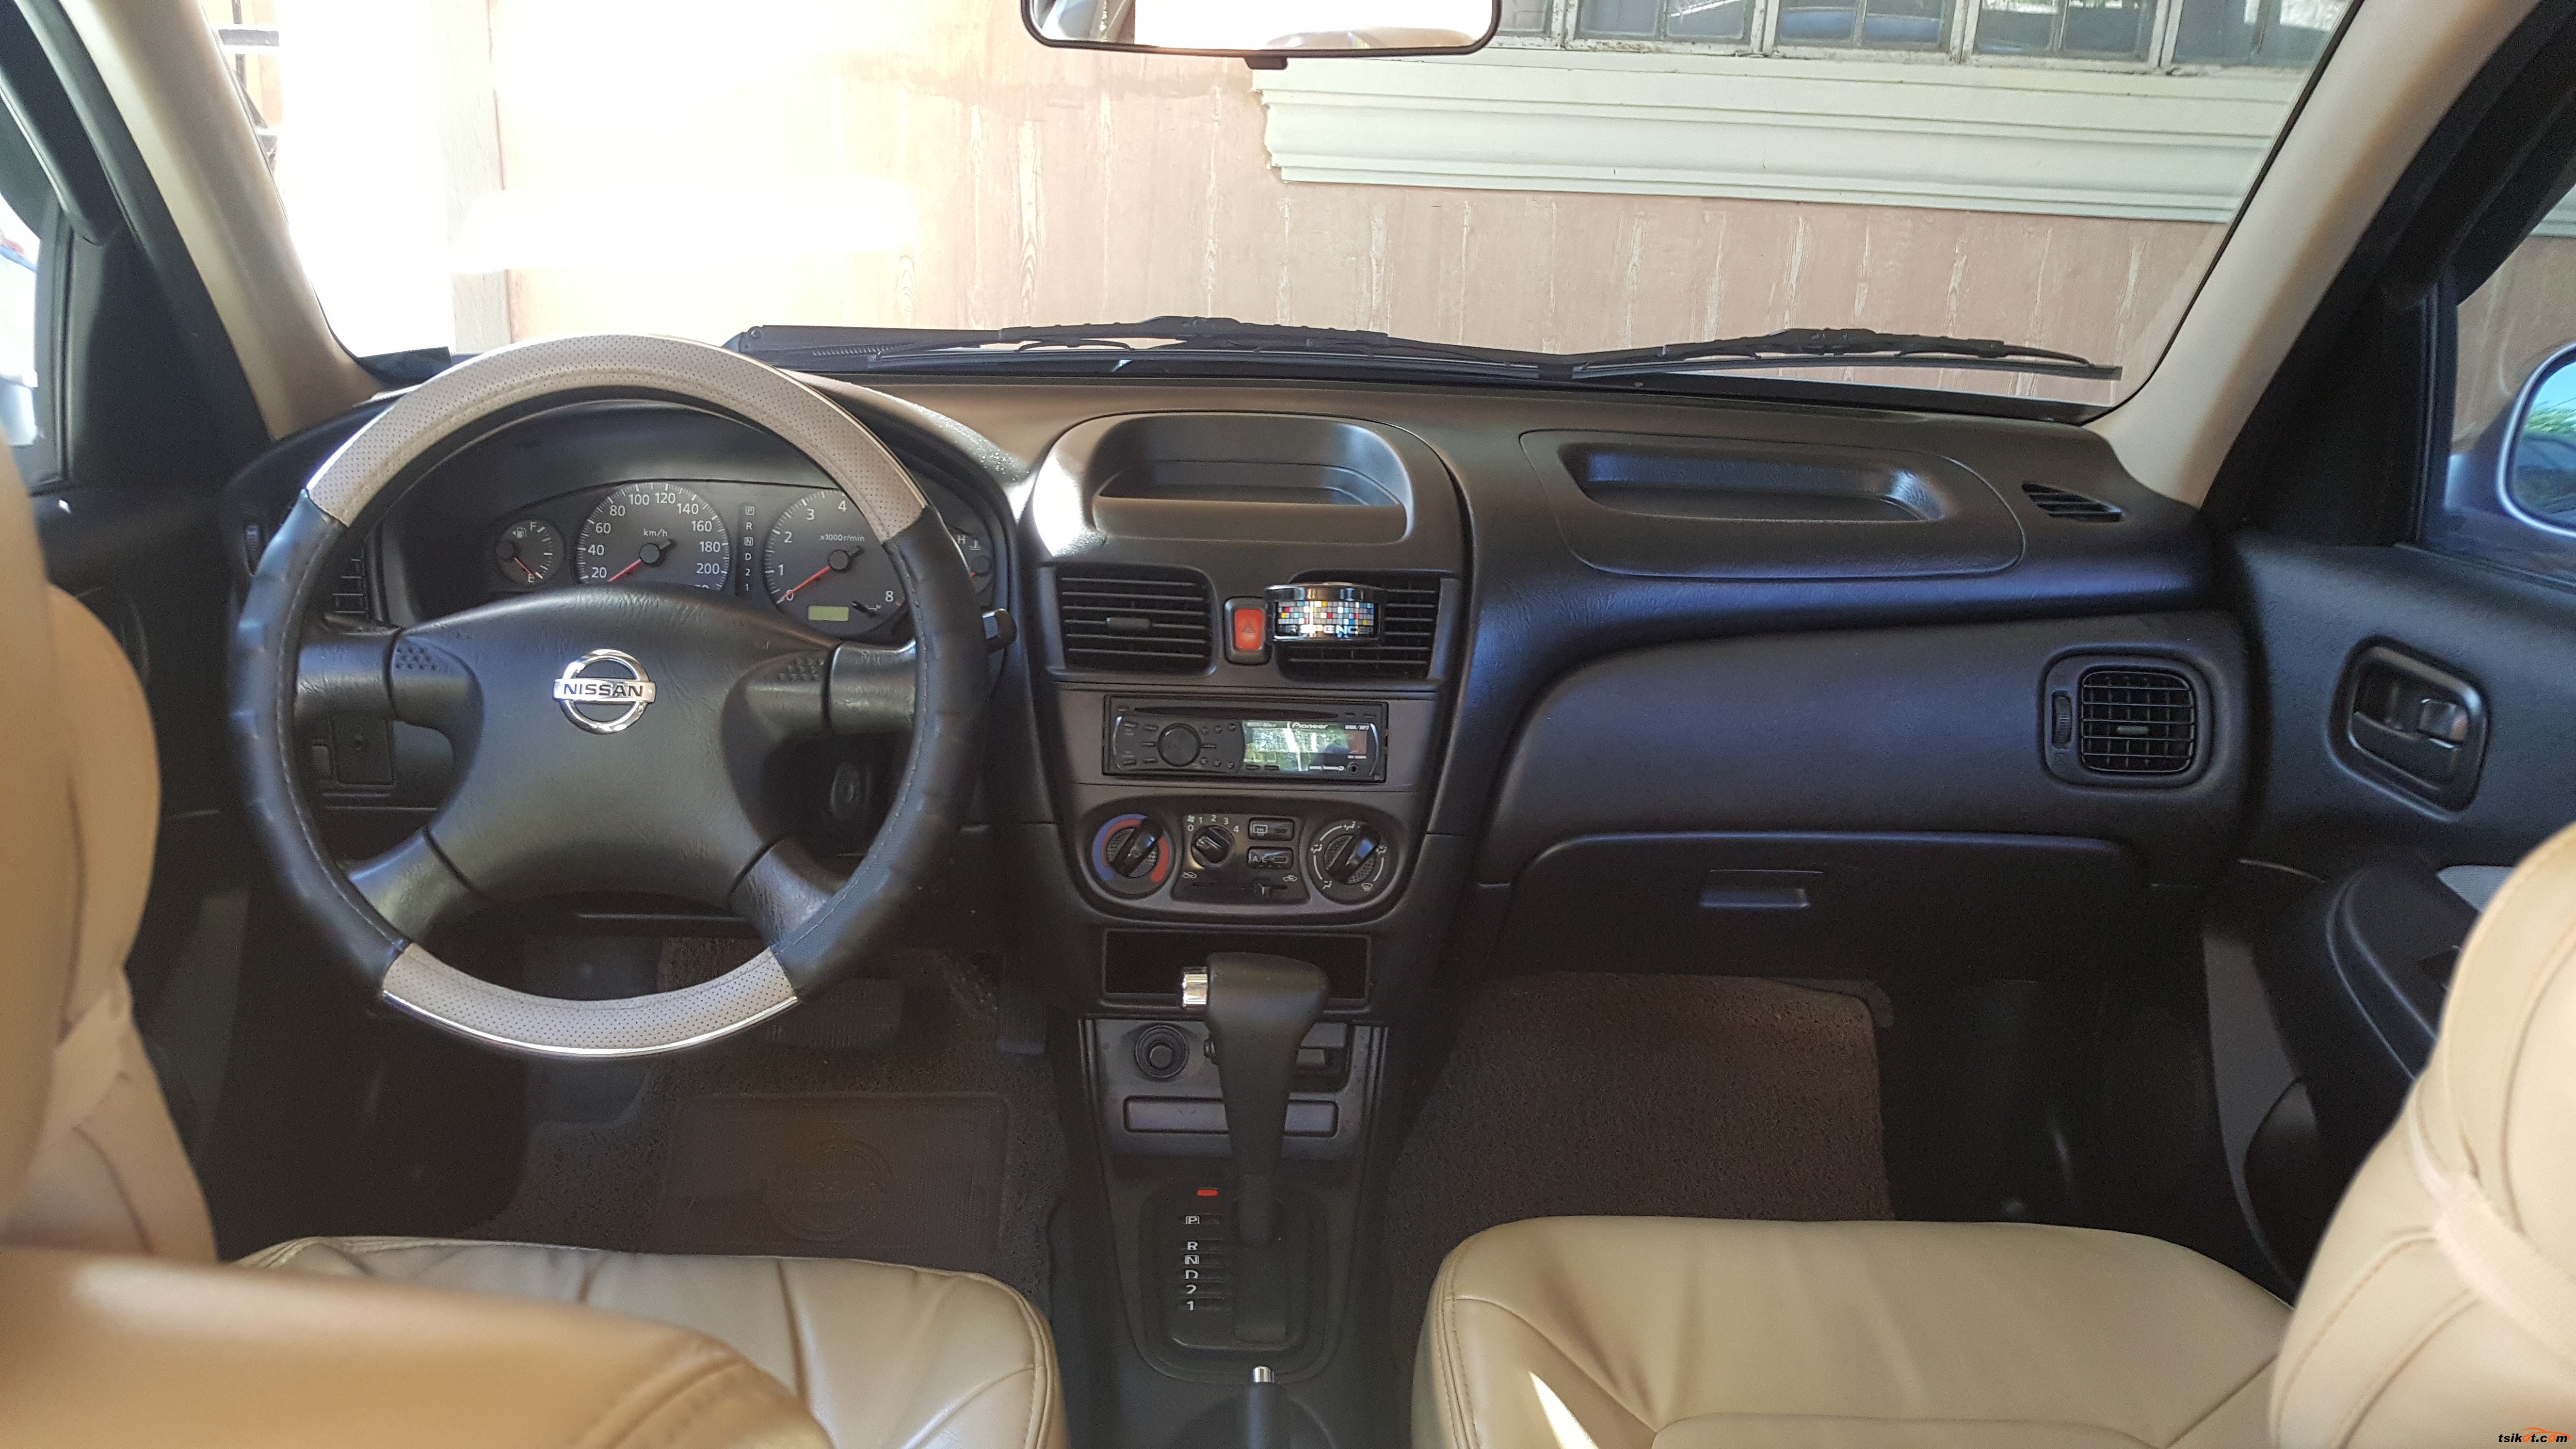 Nissan Sentra 2008 - 4